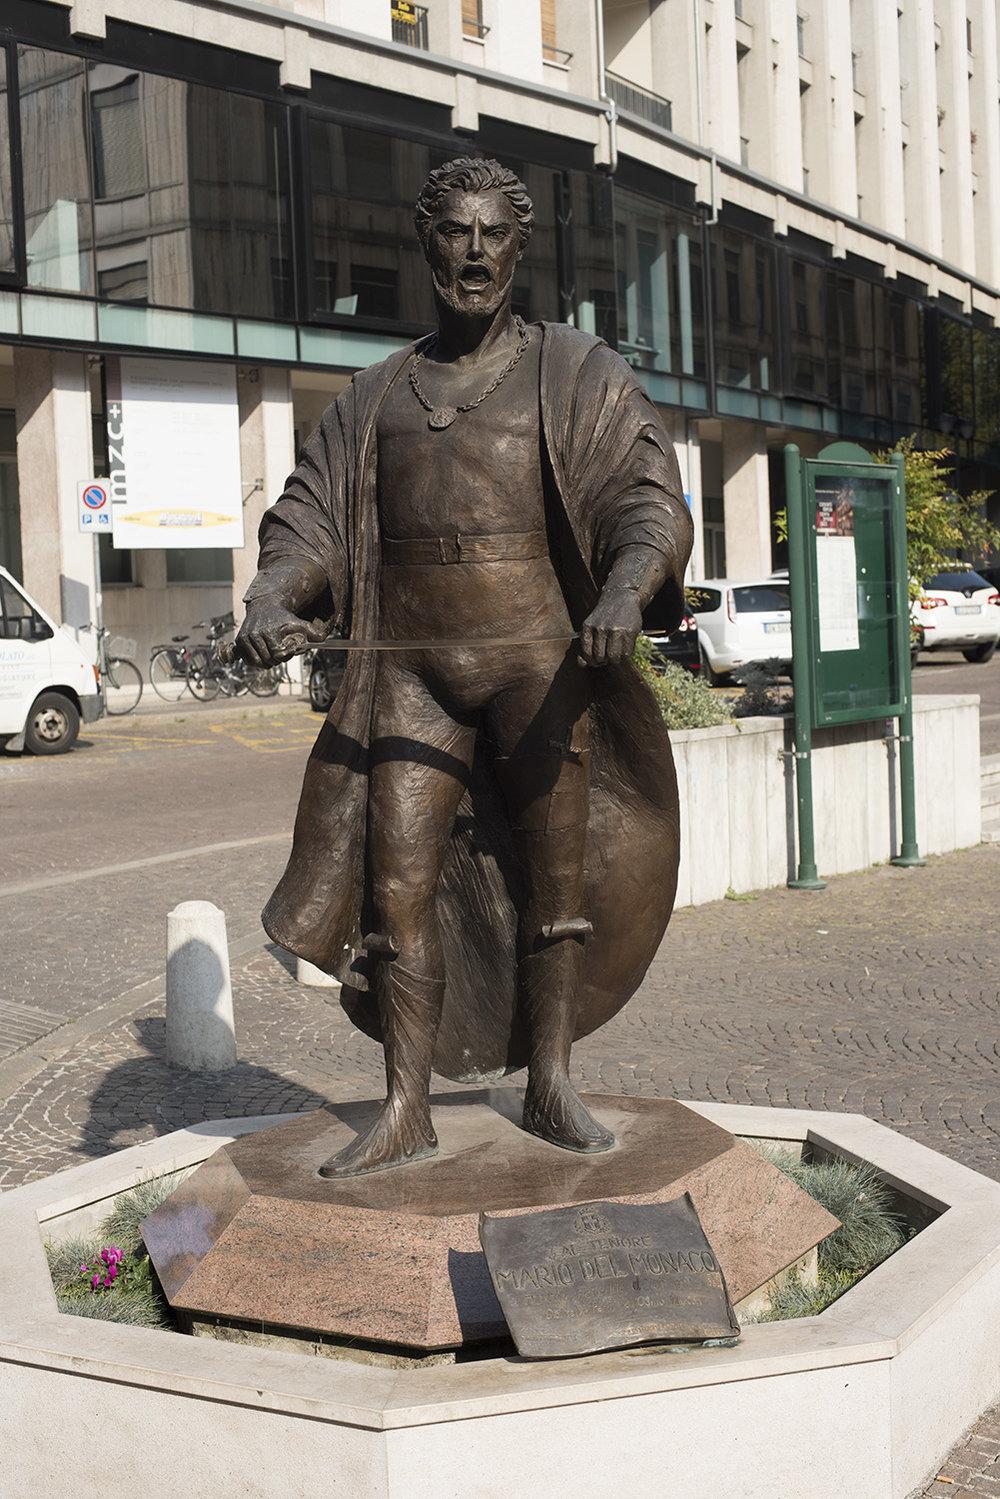 AS17-02077 Stature of the tenor Mario del Monaco, Treviso, Veneto